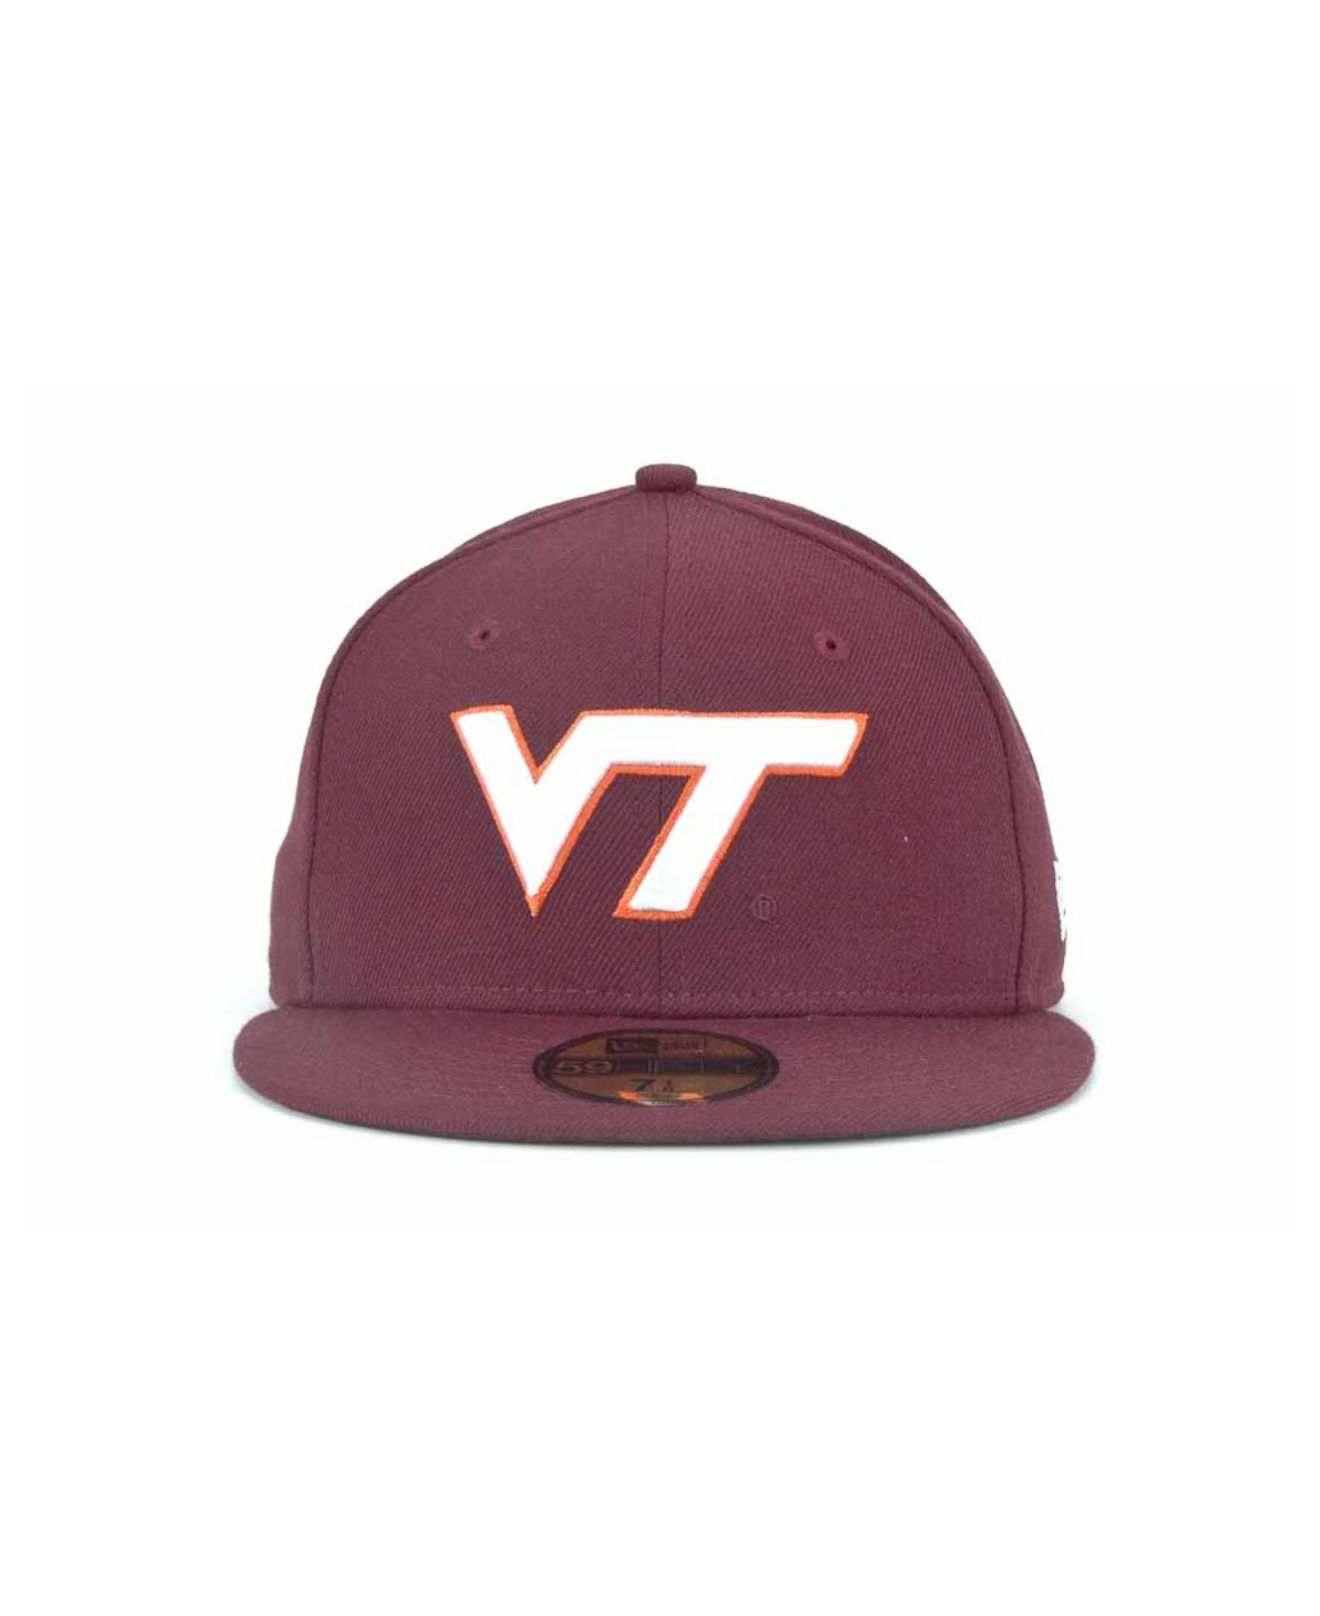 low priced 3f32c 9a44c Lyst - KTZ Virginia Tech Hokies 59fifty Cap in Purple for Men